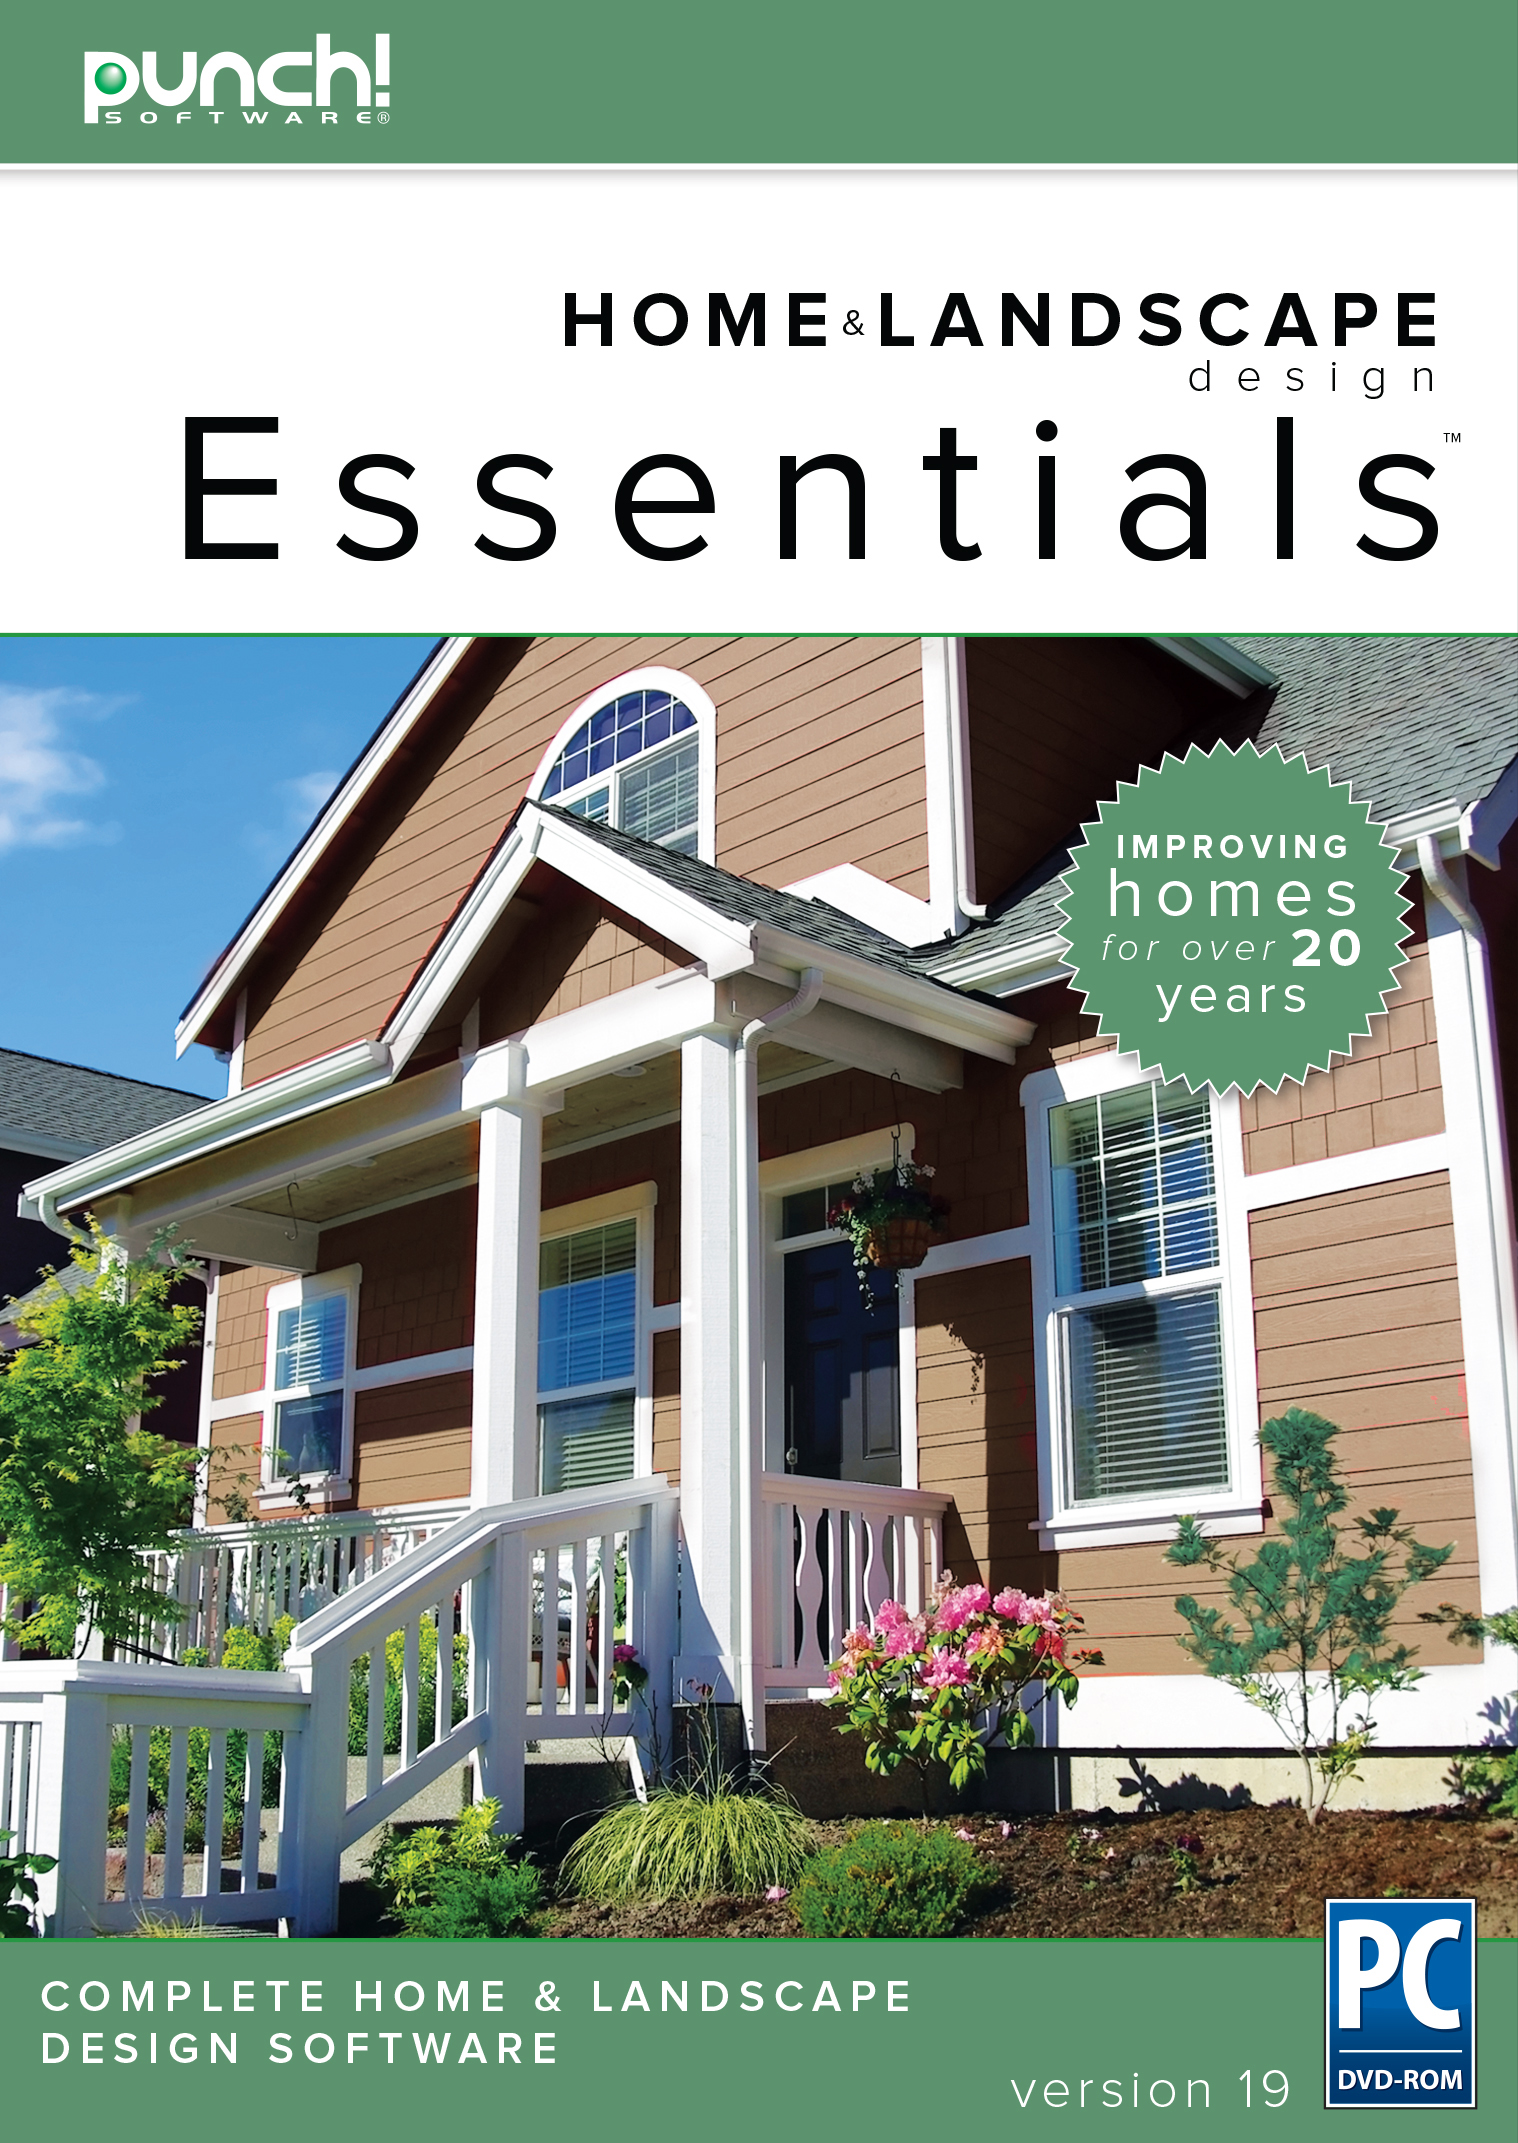 Punch! Home & Landscape Design Essentials v19  for Windows PC [Download] by Encore